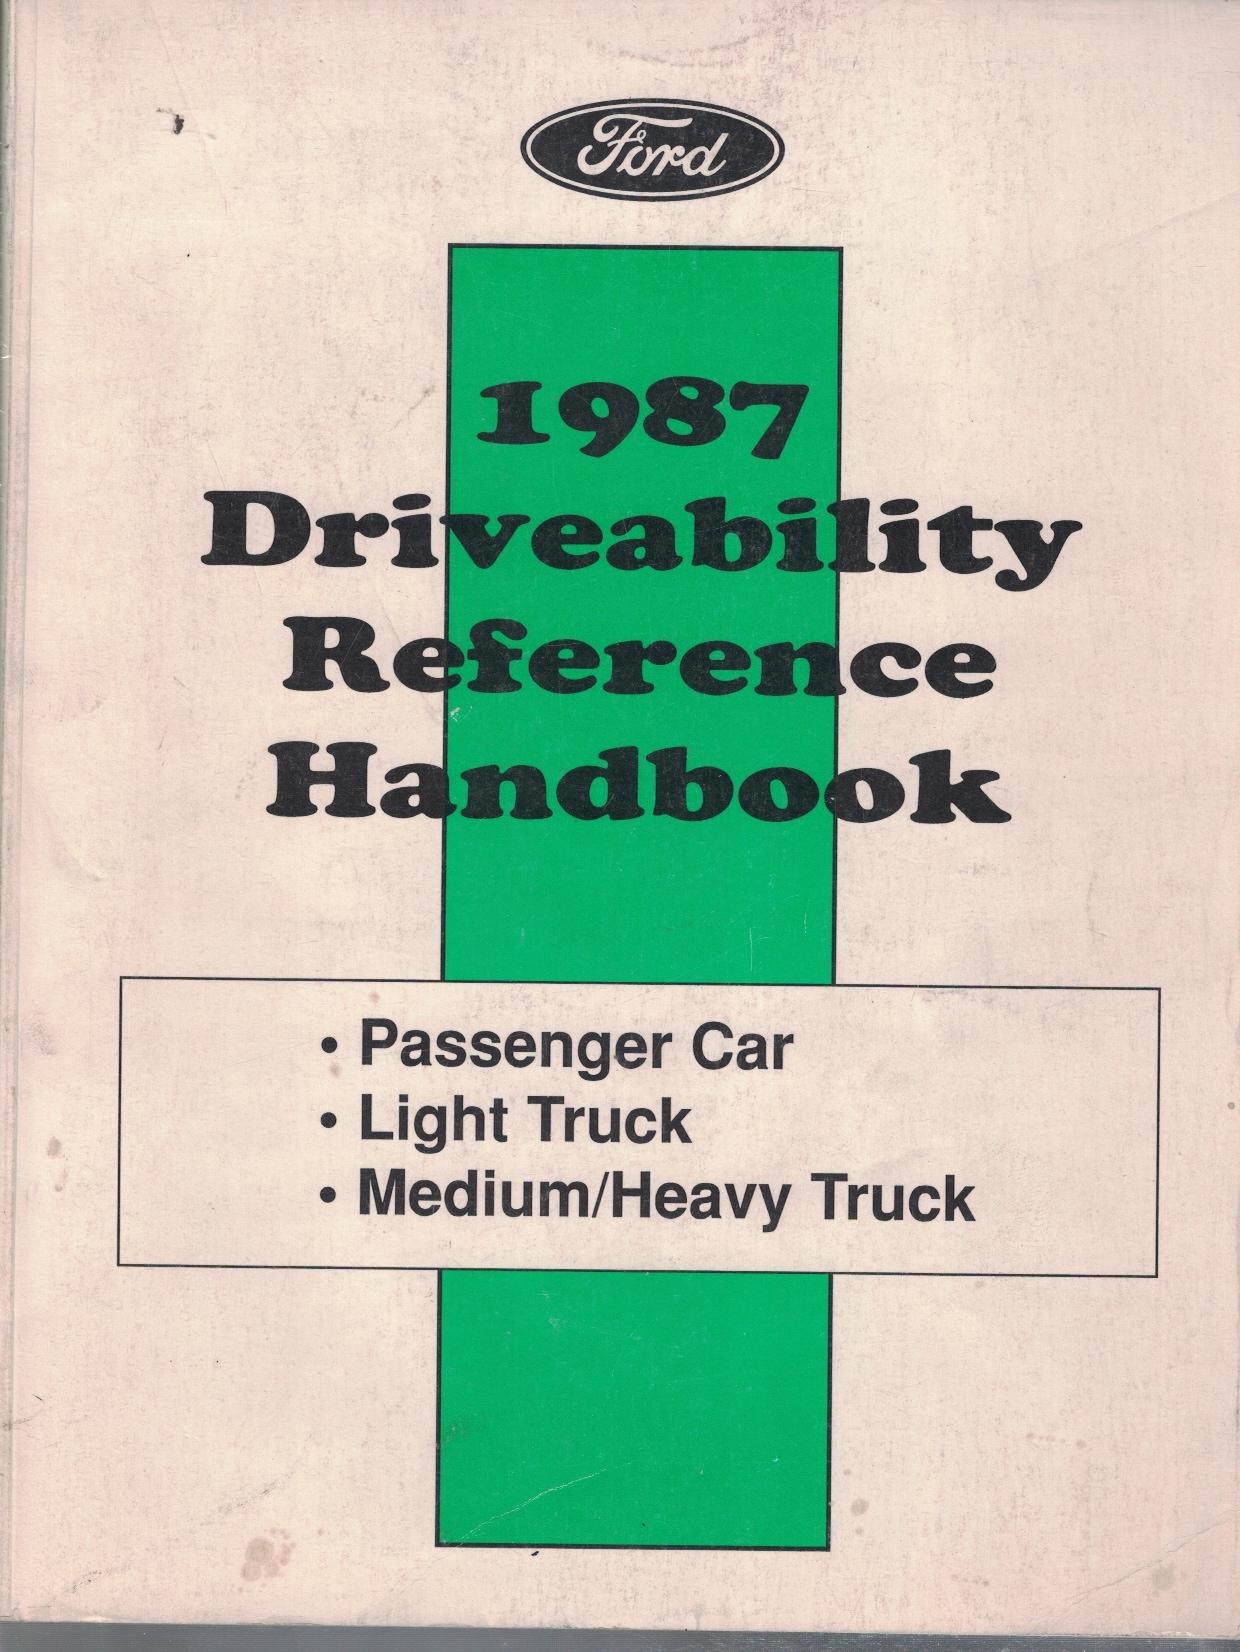 Image for 1987 Ford Driveability Reference Handbook: Passenger Car, Light Truck, Medium/Heavy Truck  [Original Service Manual]